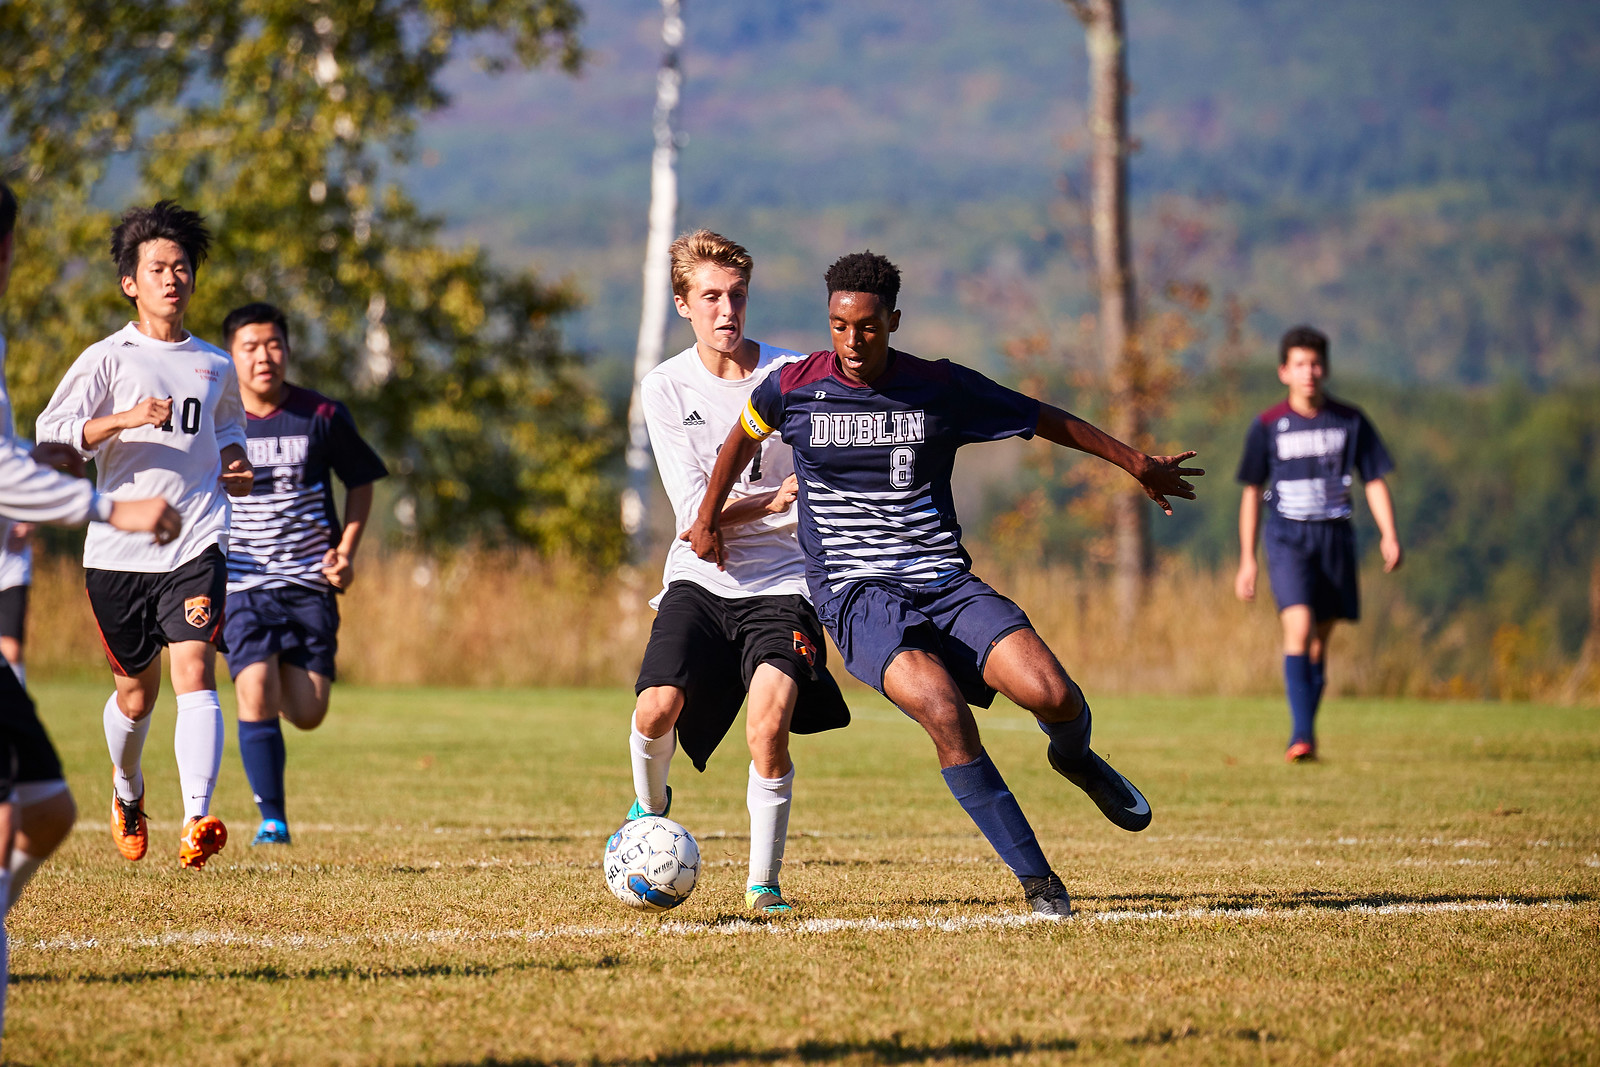 Boys Varsity Soccer vs. Kimball Union Academy - September 23, 2017    - 61932-X3.jpg